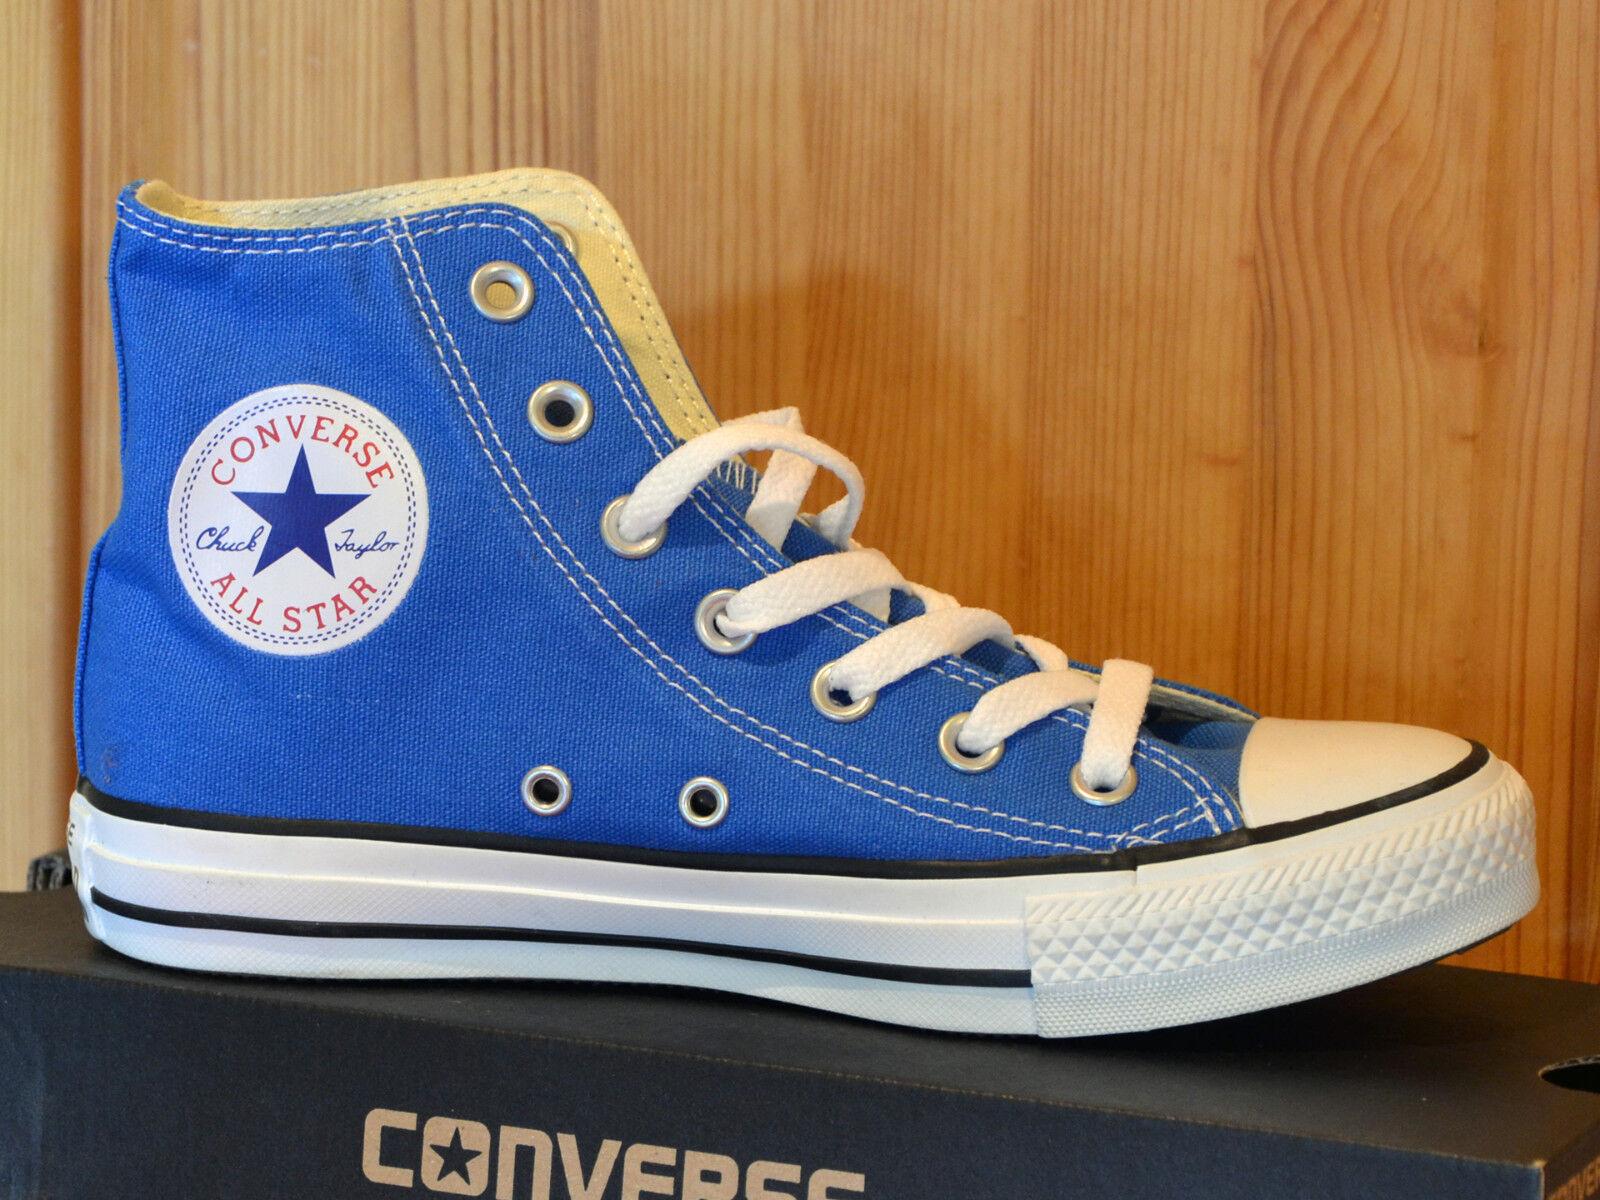 Converse Chucks Taylor All Star Hi UK 4,5 EU Blau 37 light sapphire blau Blau EU 147129C 5a25e2